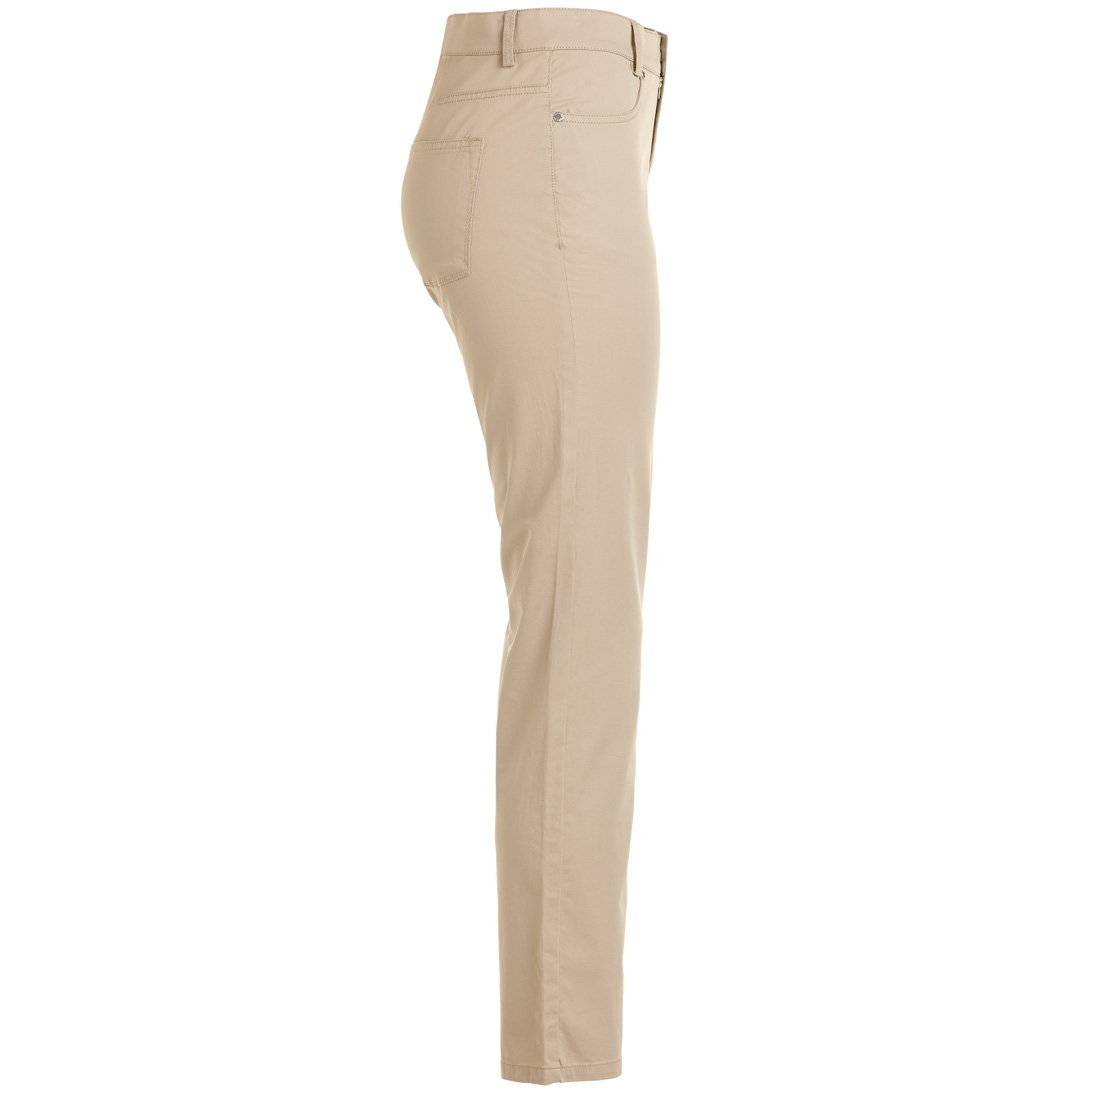 Damen 7/8-Baumwoll Stretch Hose